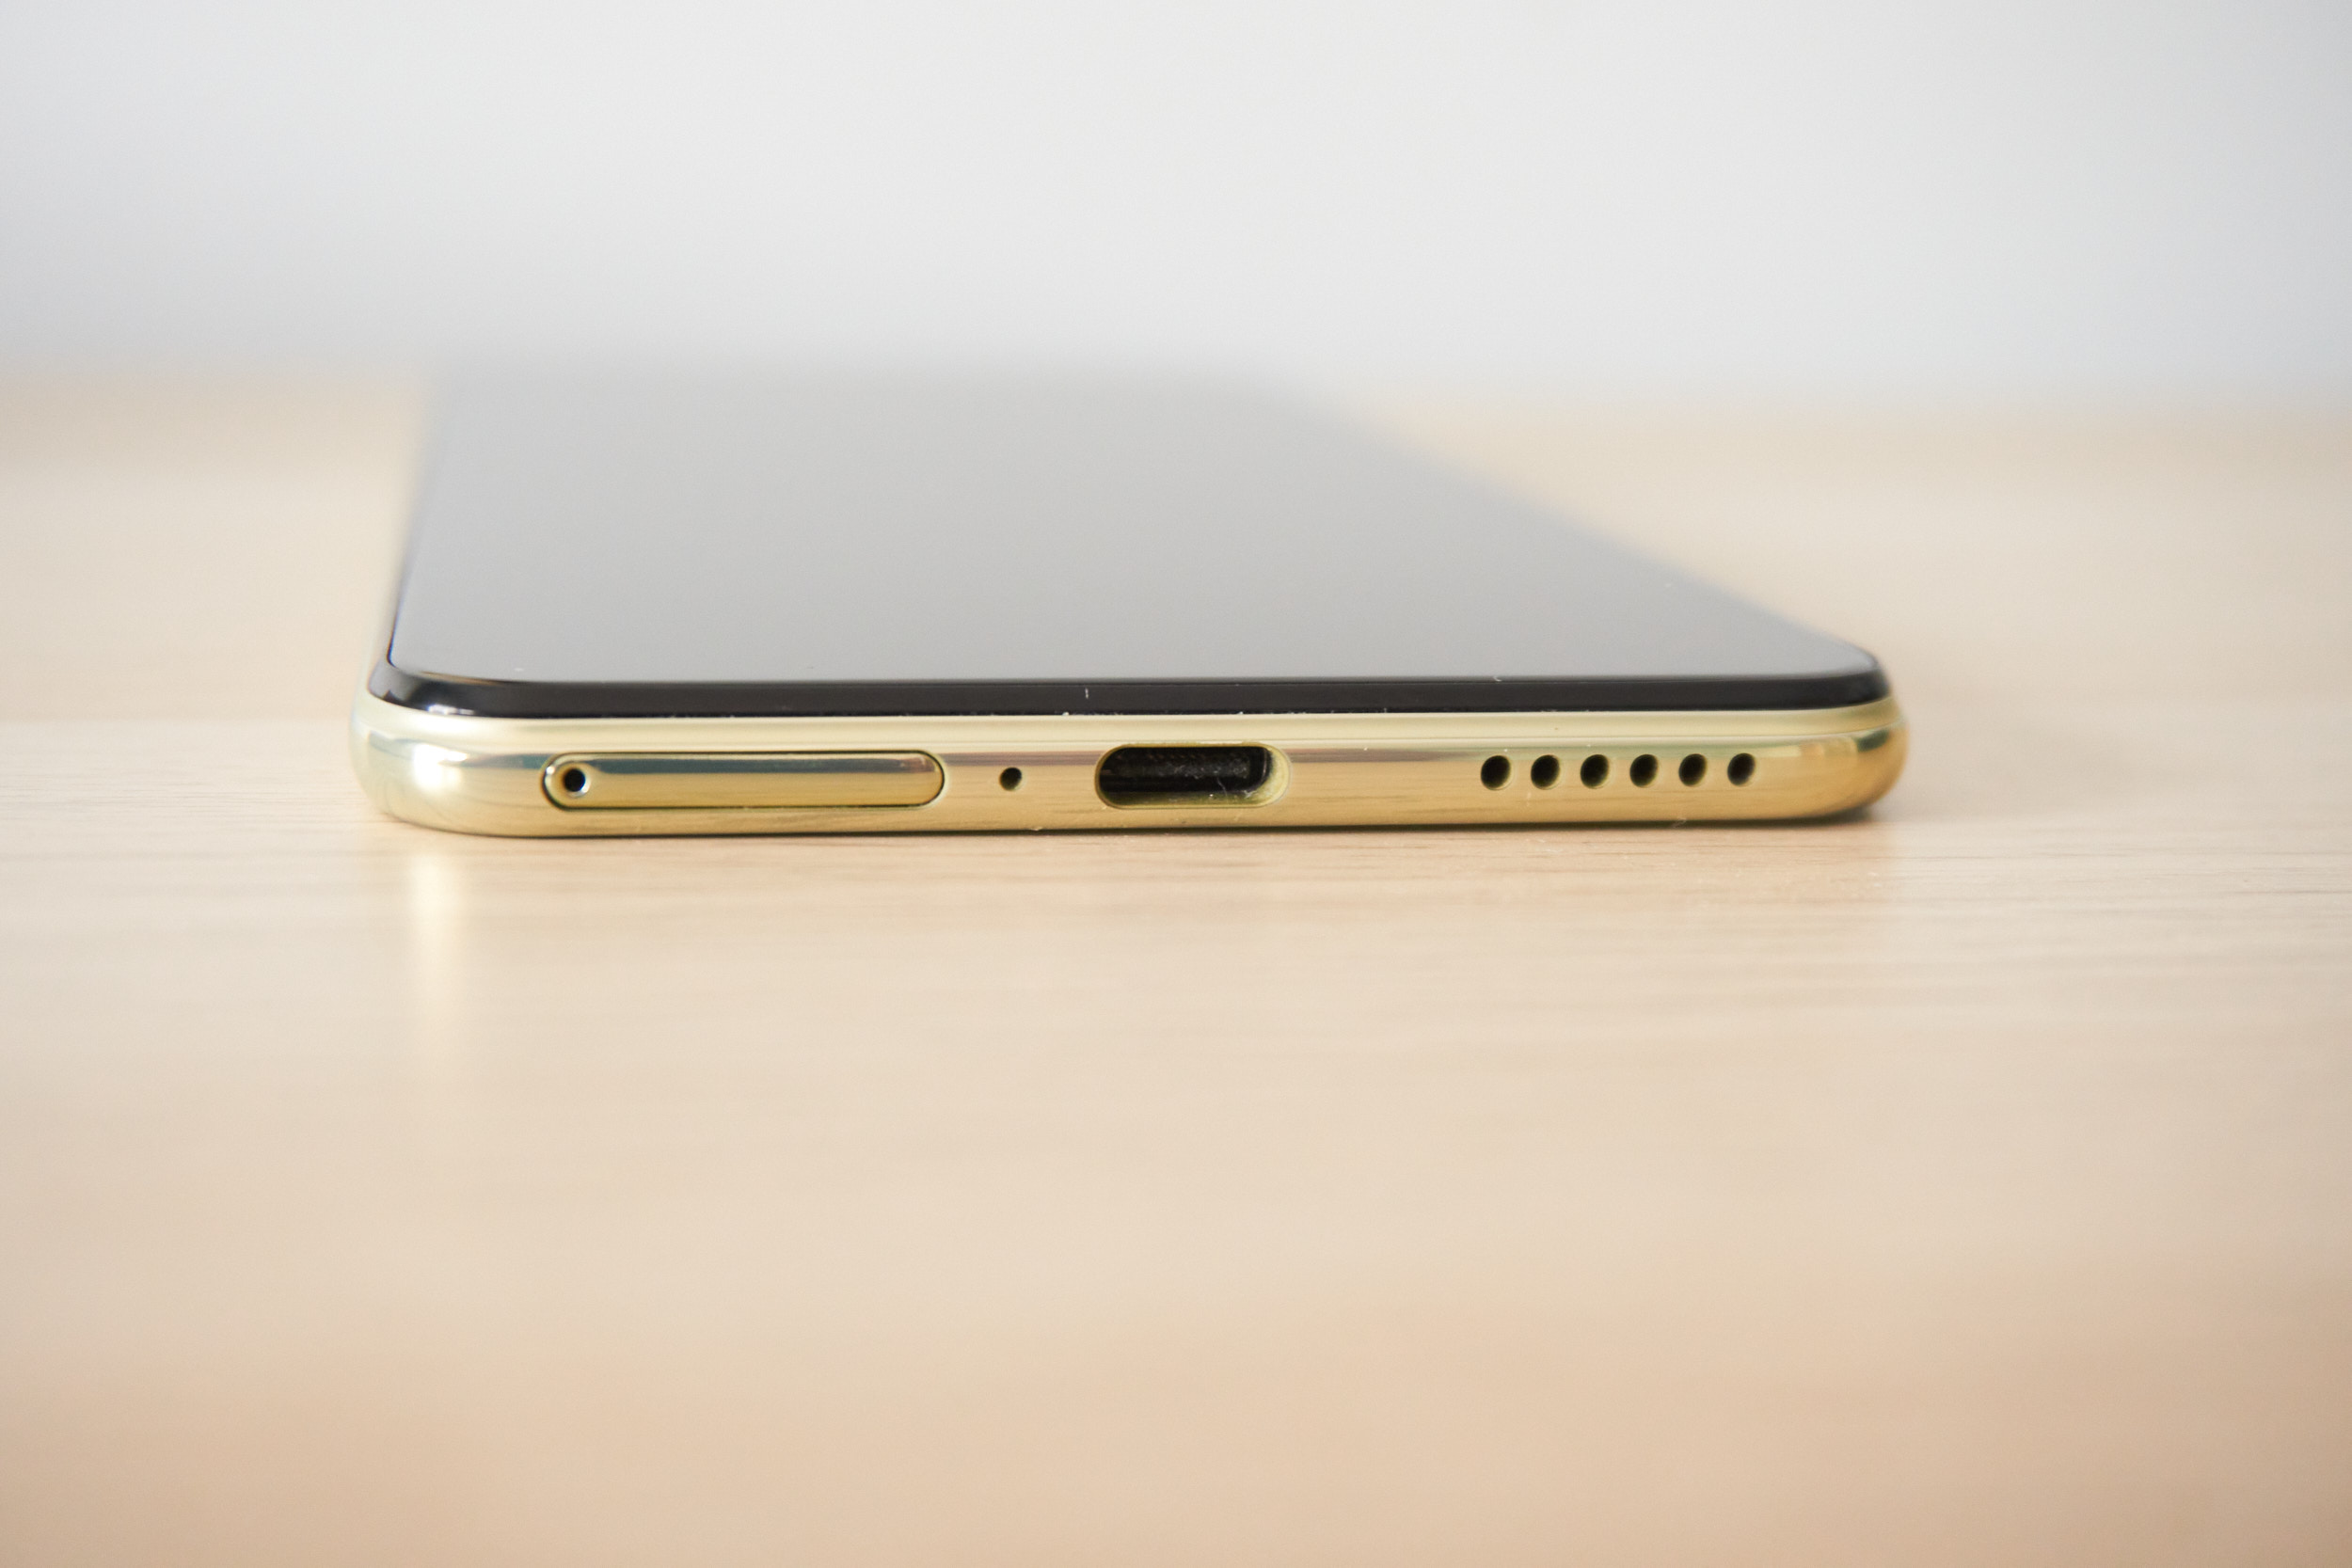 Xiaomi Mi 11 Lite 5G fot. Tabletowo.pl